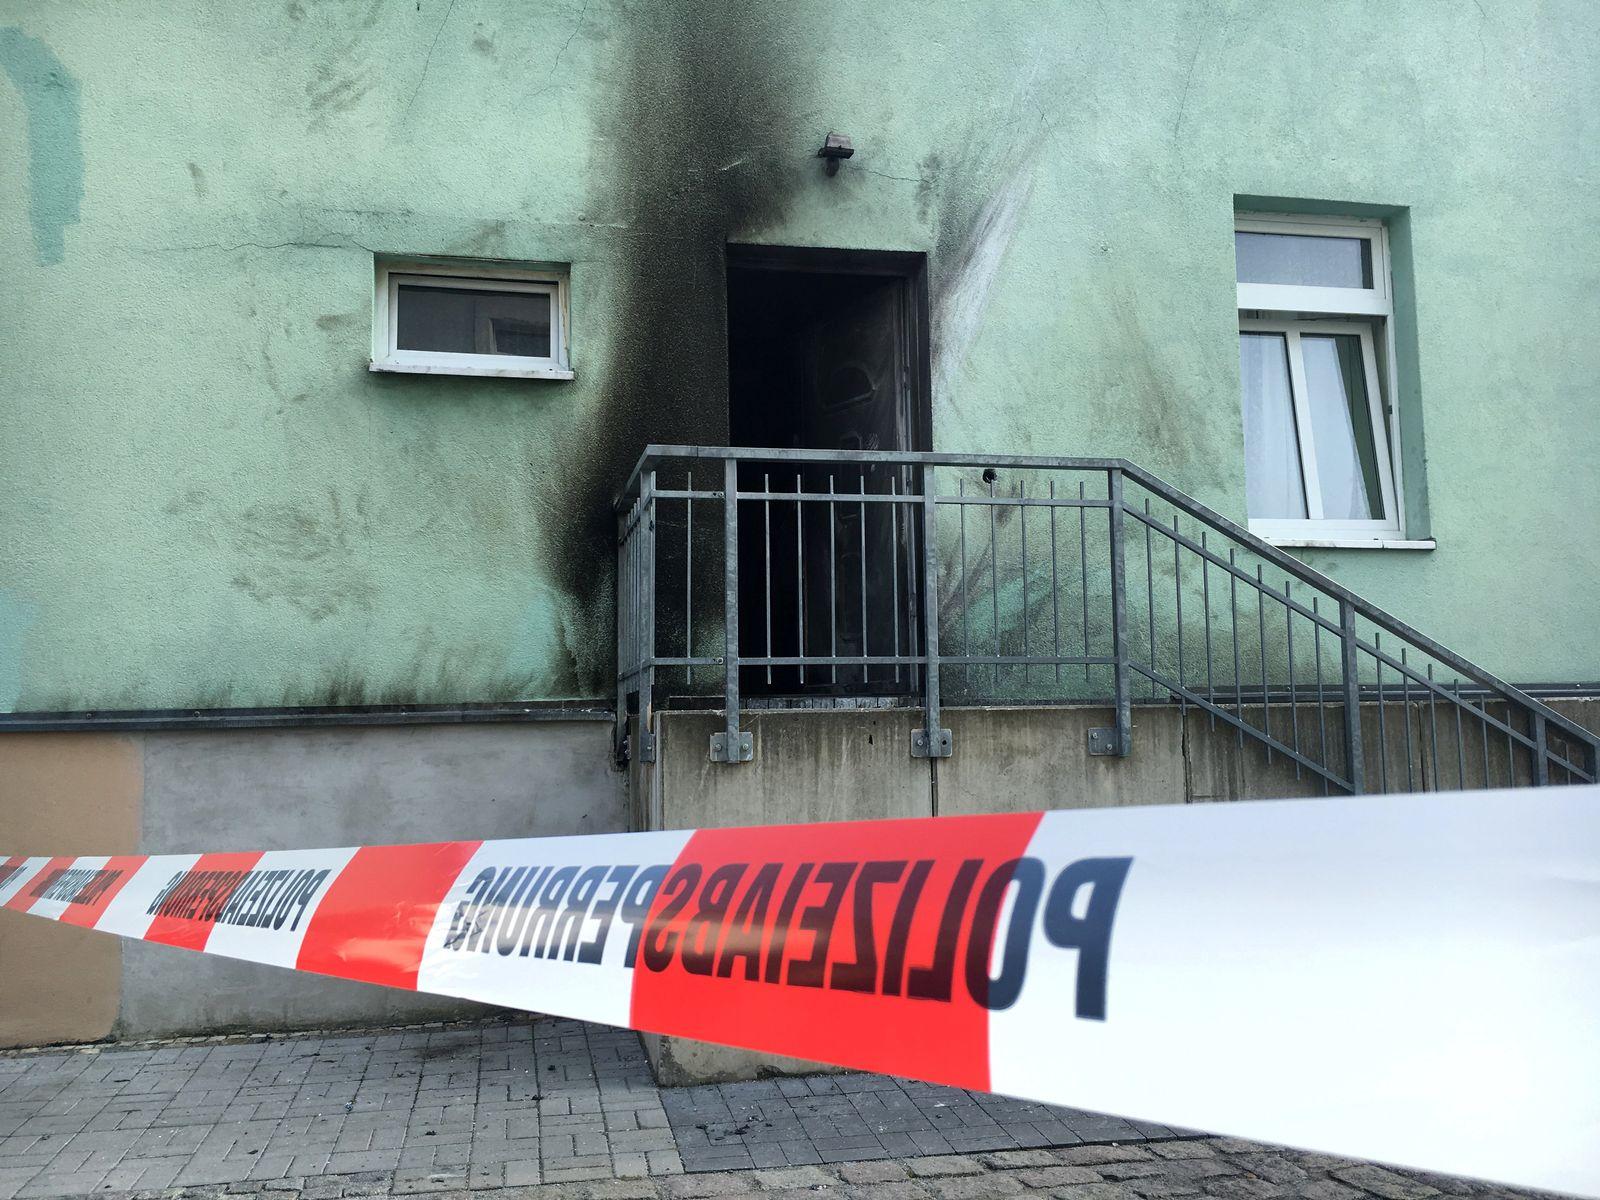 Dresden Anschlag